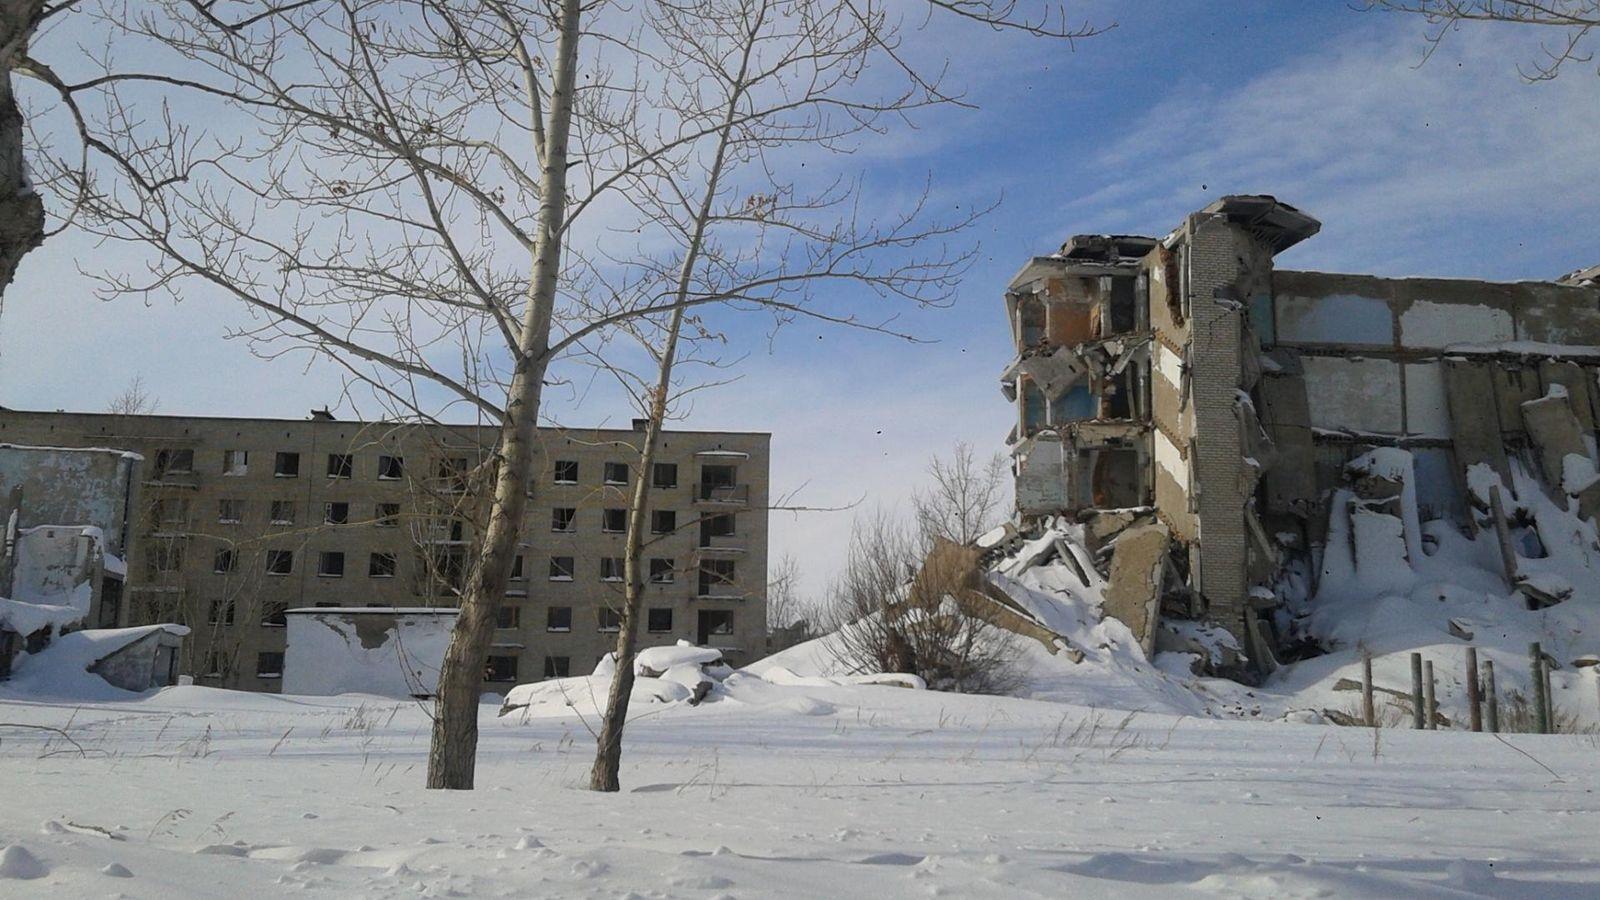 Foto: A 500 kilómetros de la capital y cerca de una mina abandonada, algo extraño ocurre en Kalachi. (Joanna Lillis/EurasiaNet.org)